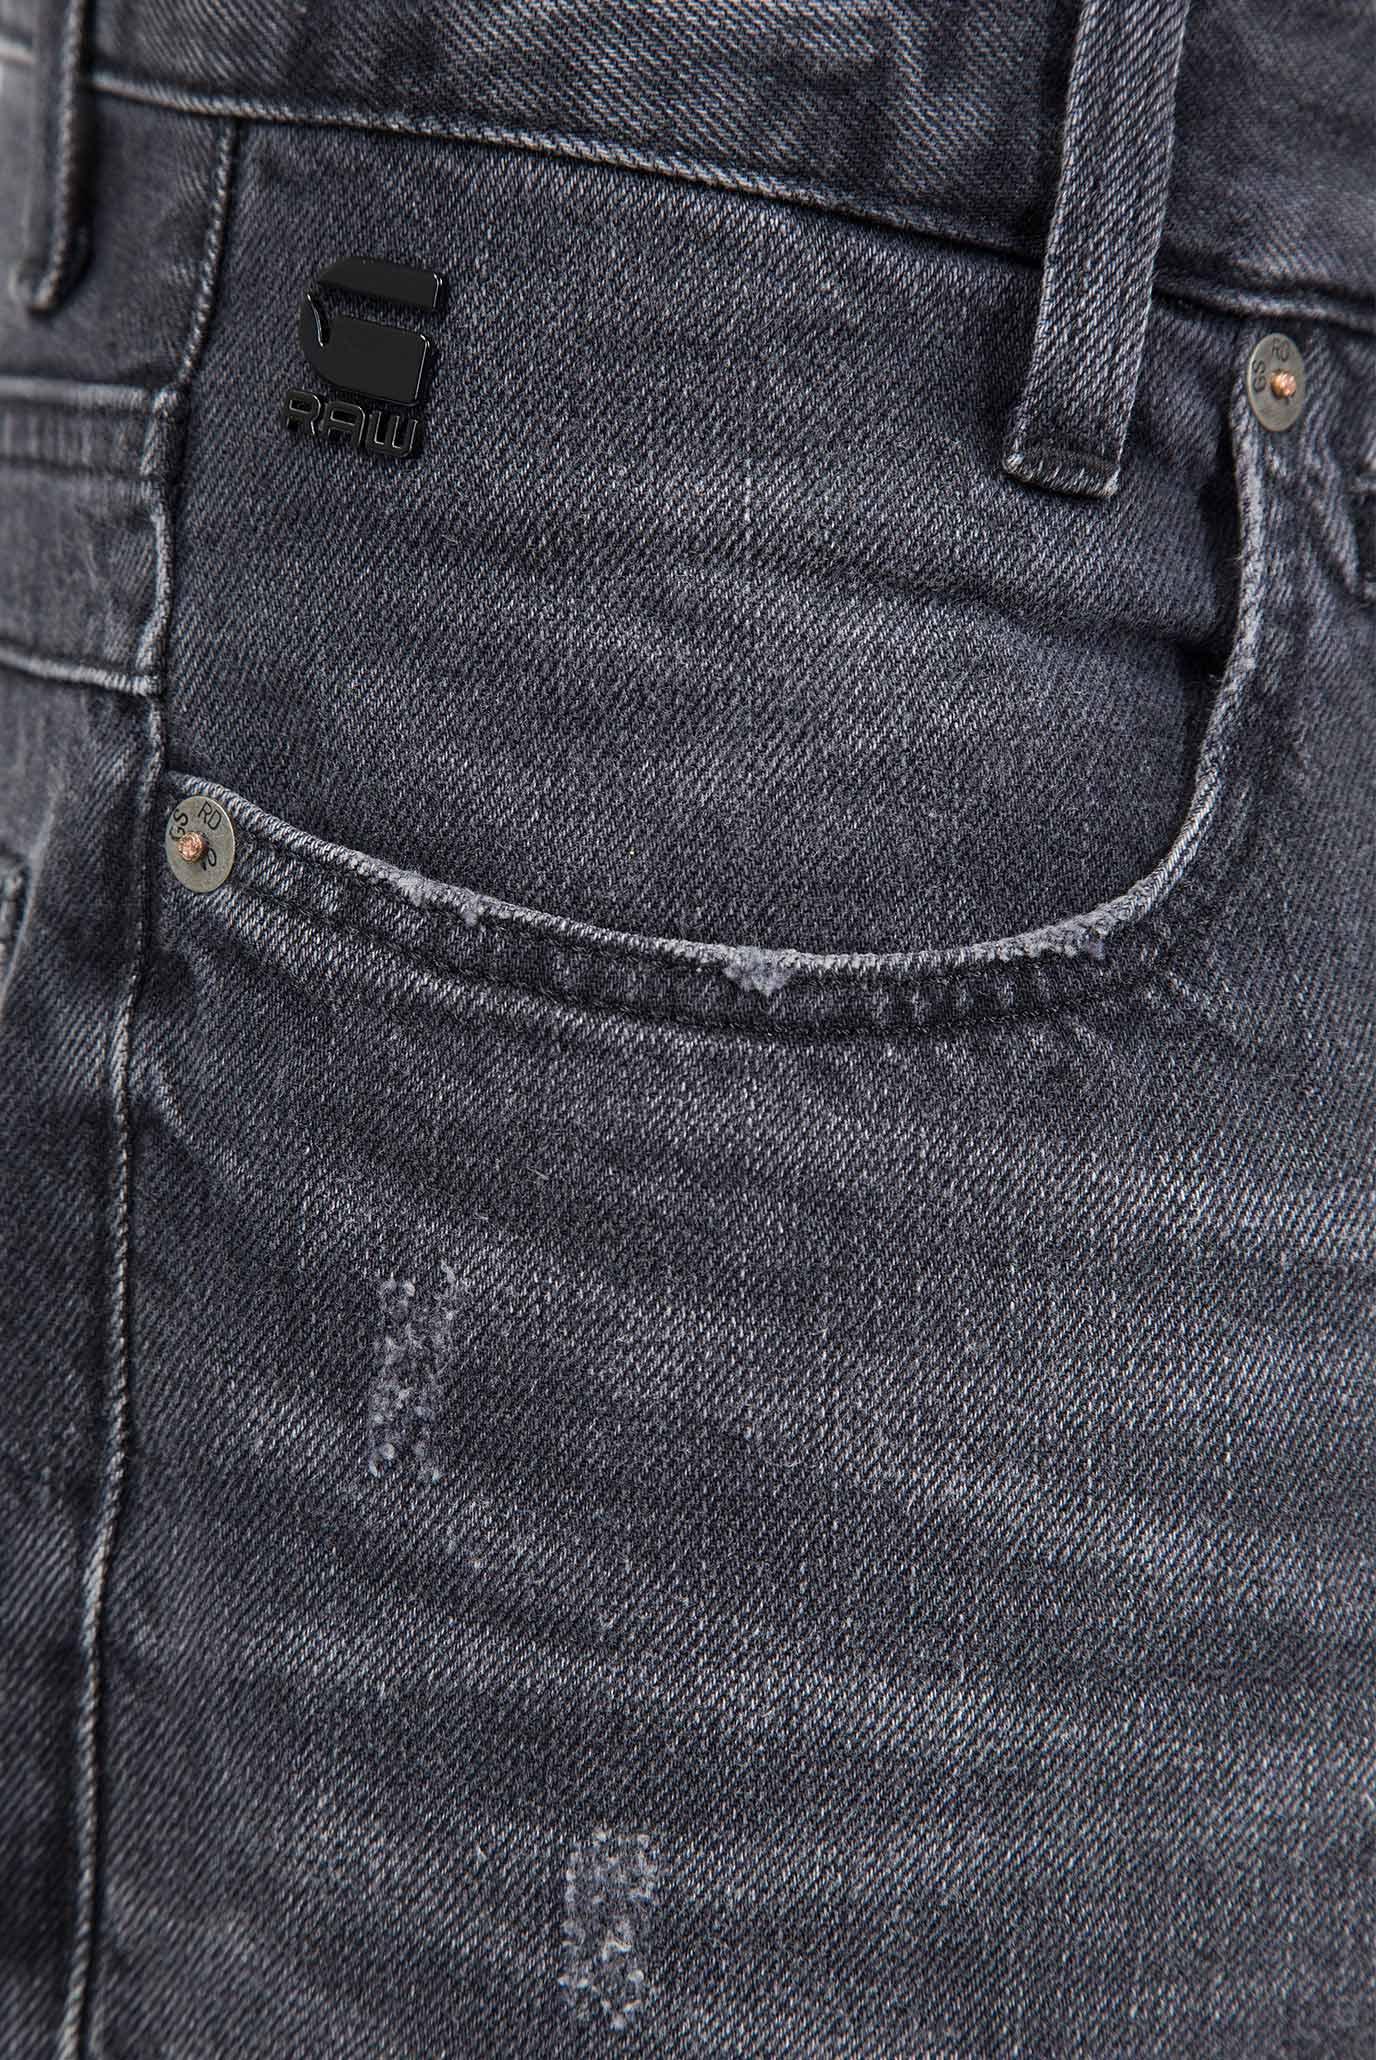 Купить Мужские темно-синие джинсы D-Staq 5-pkt Straight G-Star RAW G-Star RAW D09559,9409 – Киев, Украина. Цены в интернет магазине MD Fashion